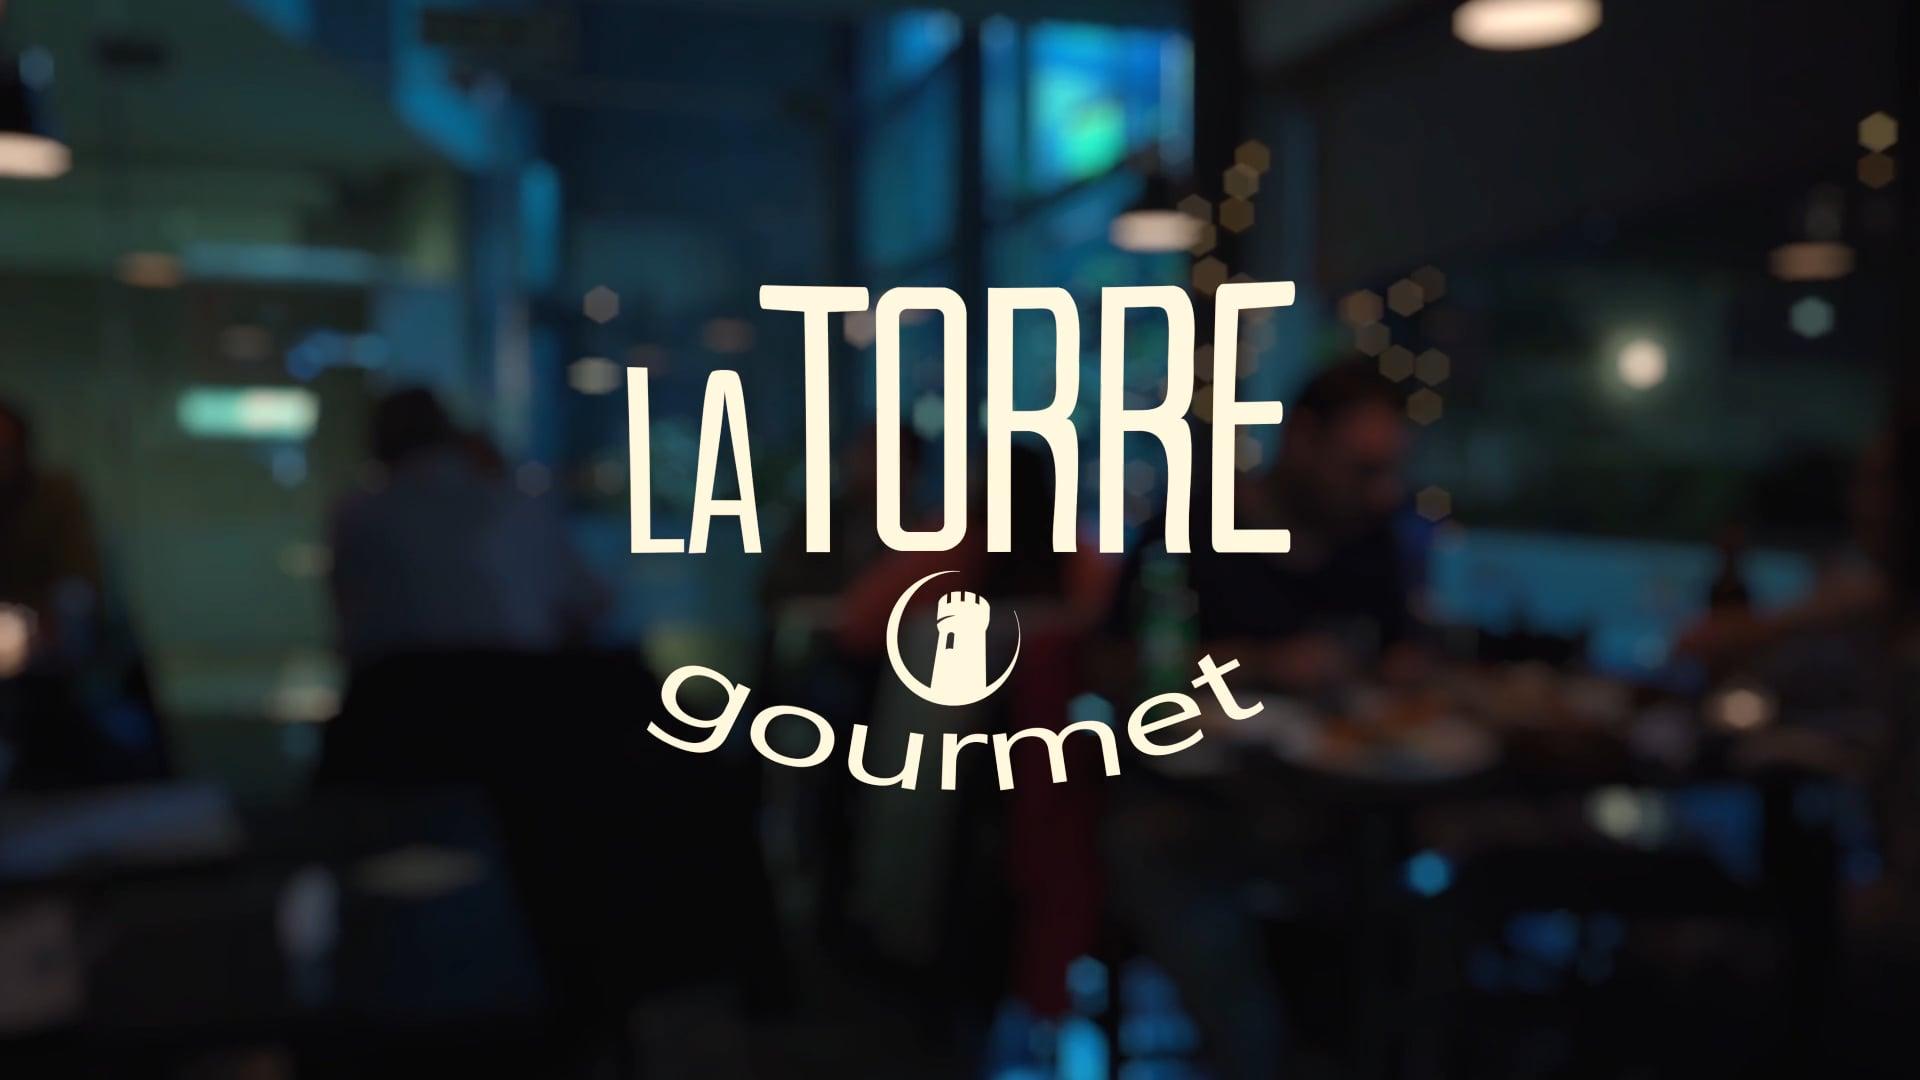 La Torre Gourmet   After